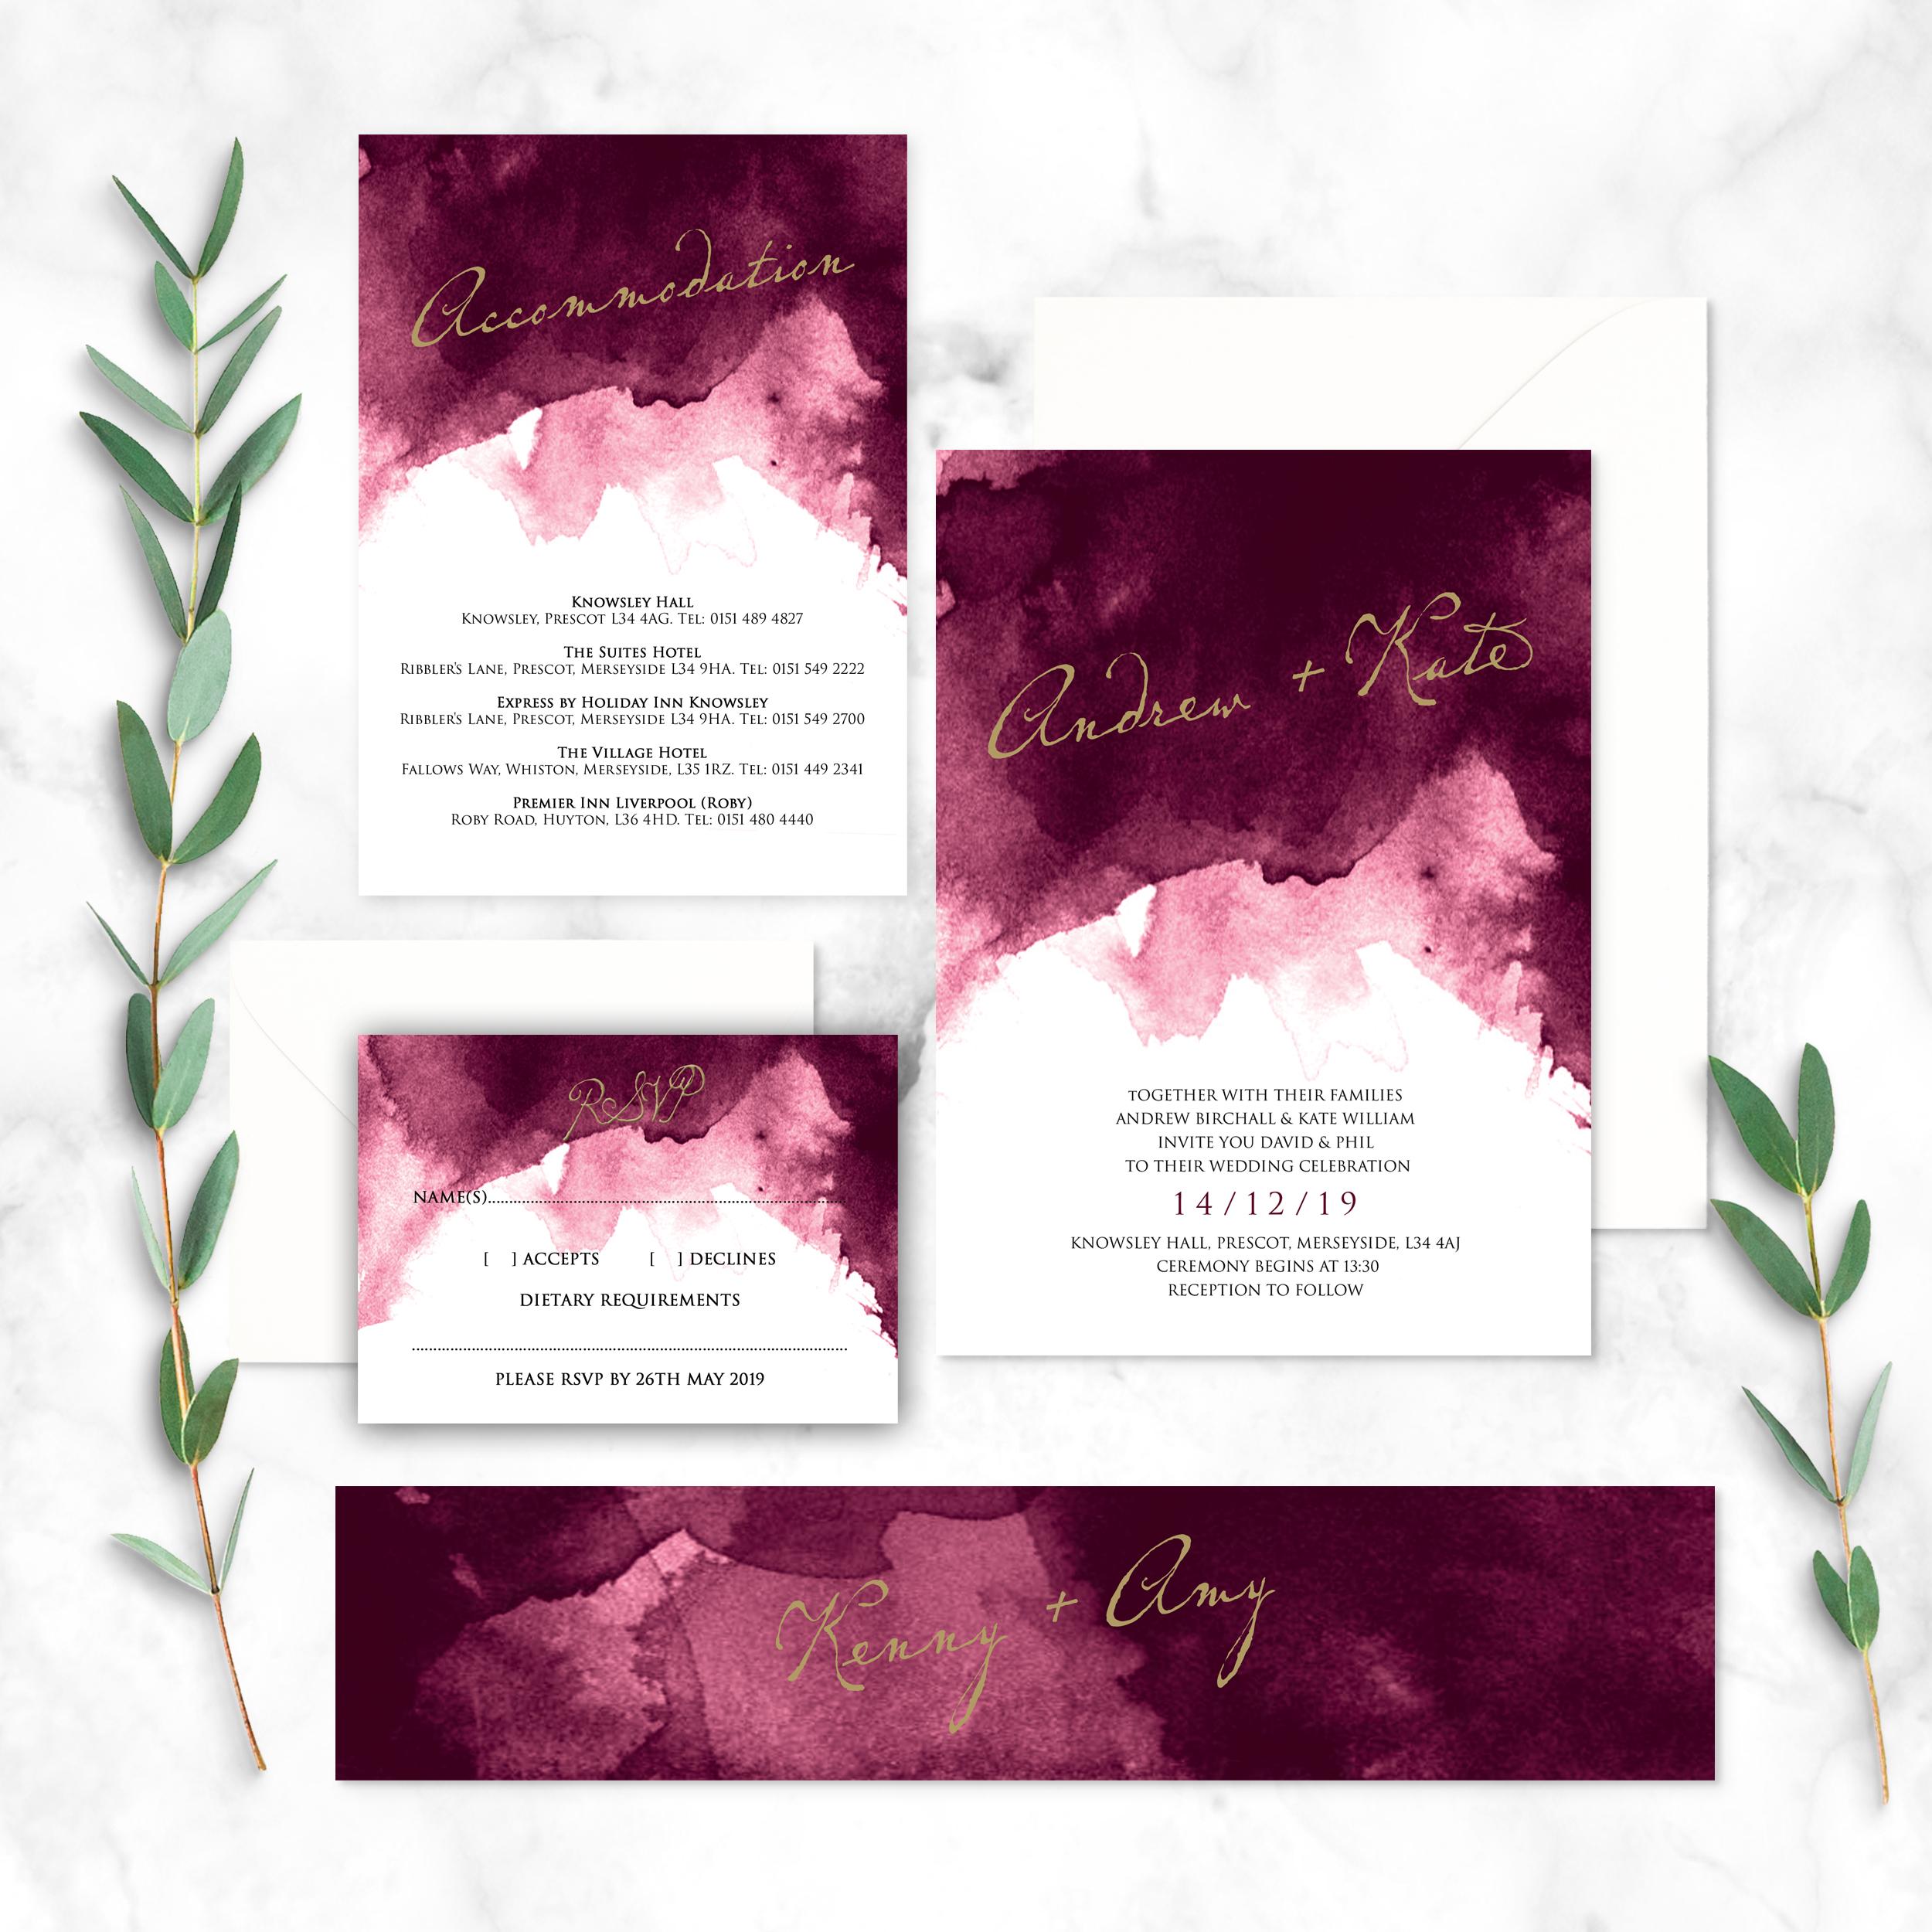 Home wedding invitations stationery liverpool by invitationly stopboris Choice Image